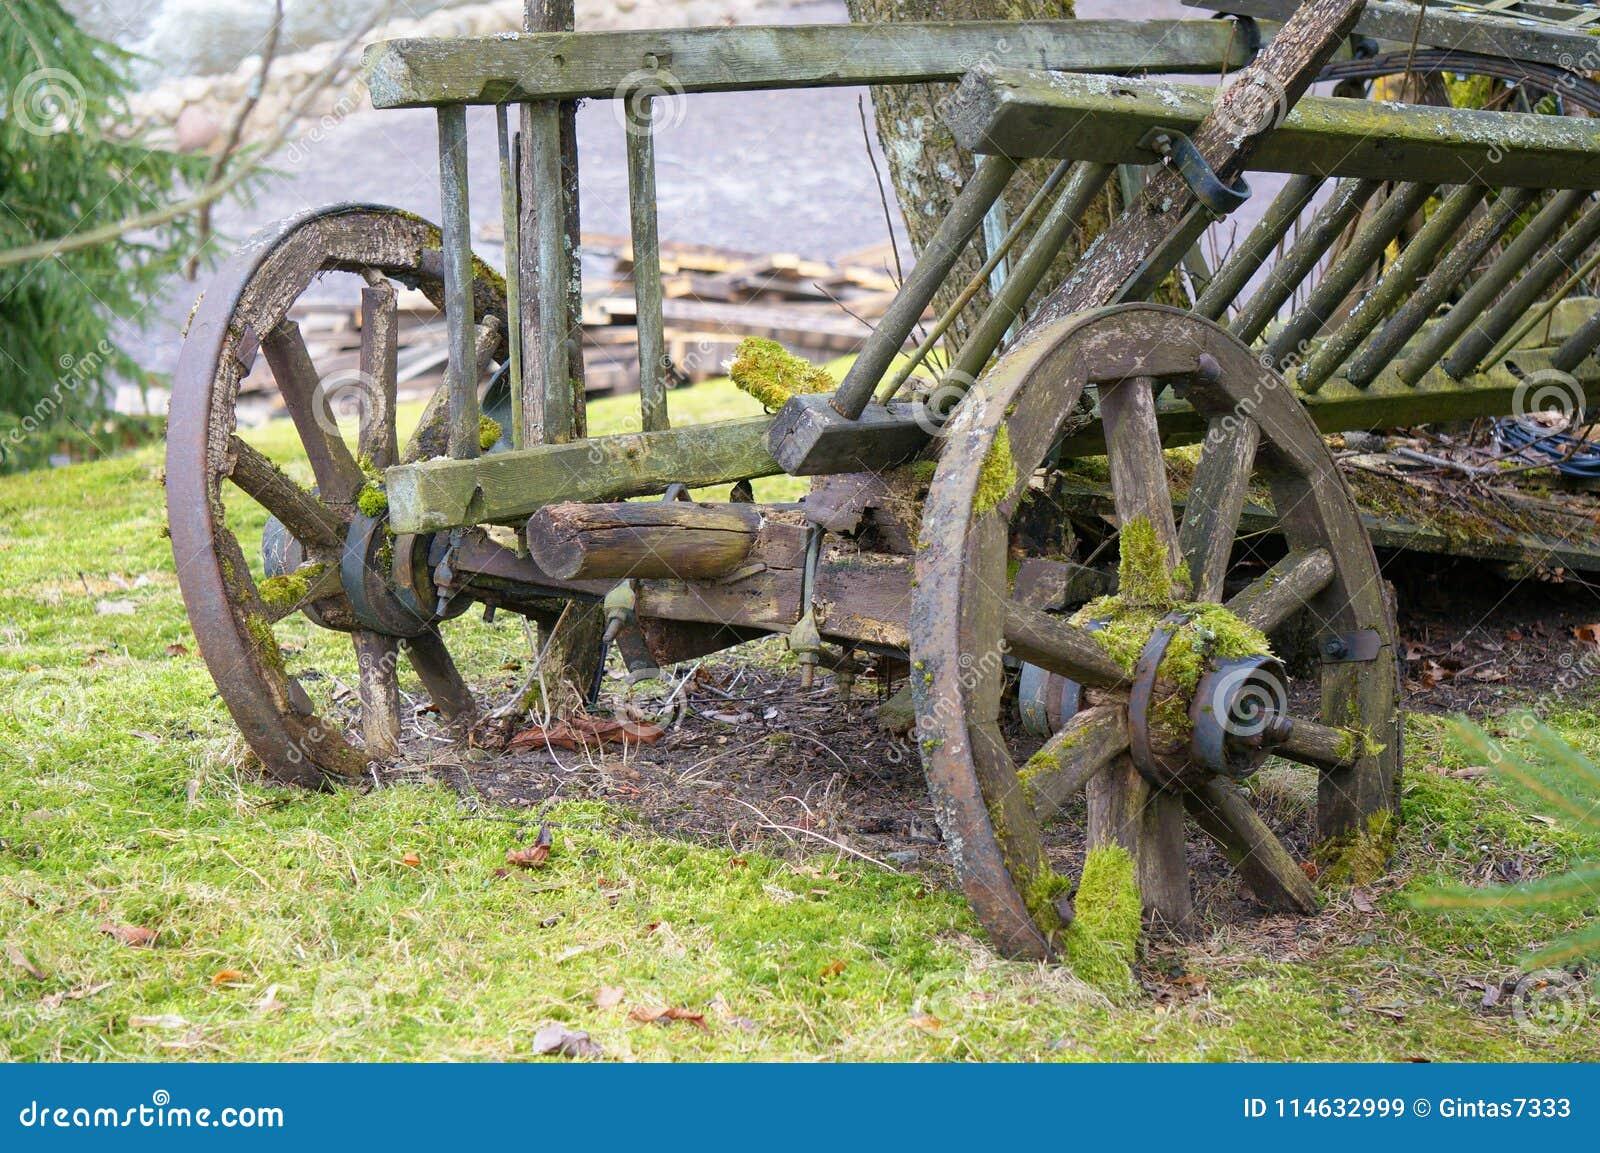 Винтажная тележка повреждено античный переход Ретро тележка стоя на лужайке Dray в траве старо